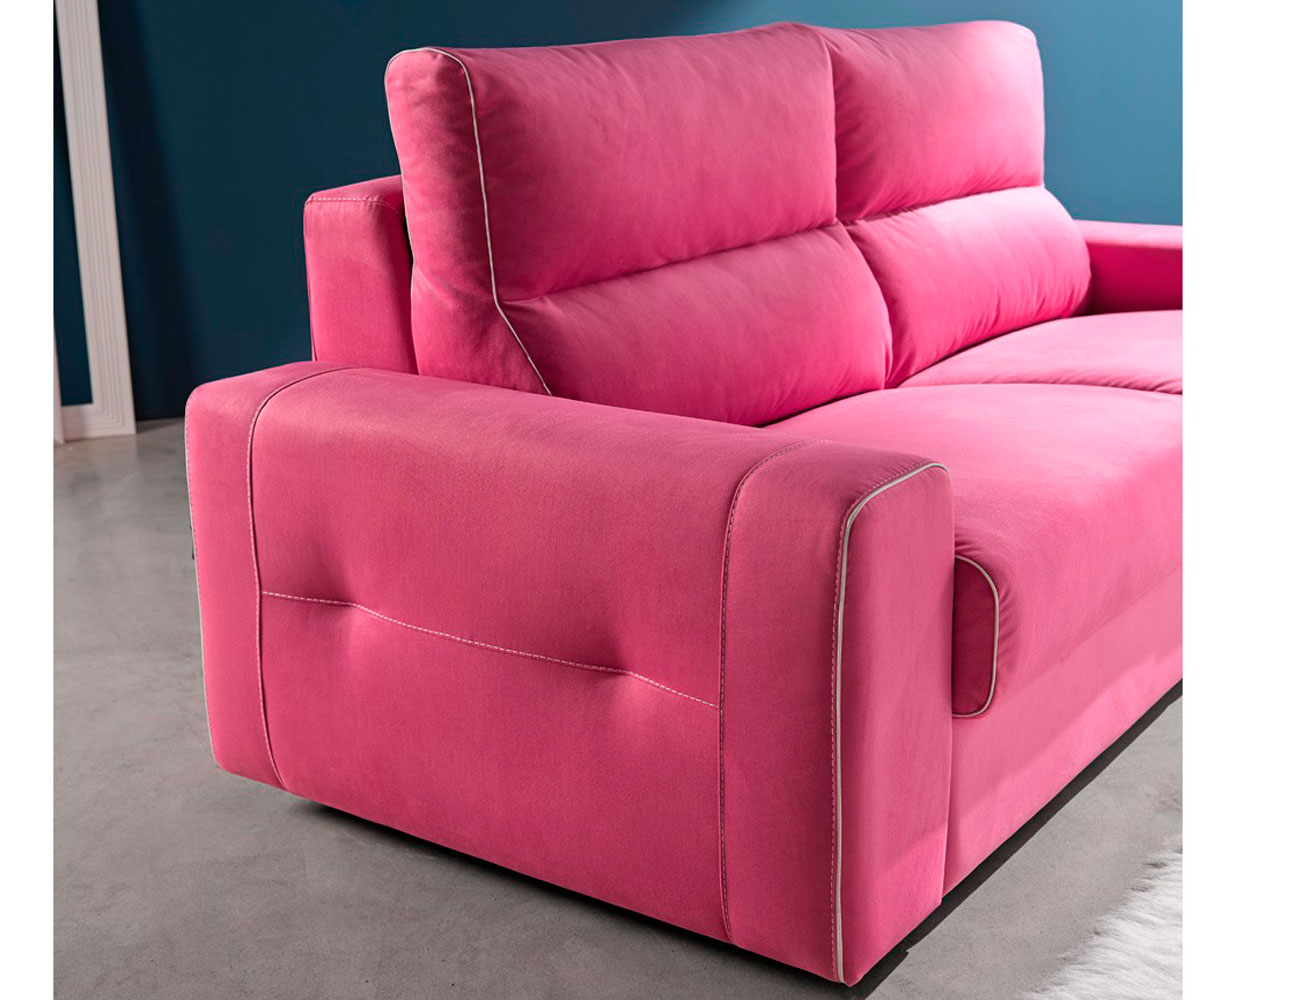 Sofa cama pedro ortiz apertura italiano 21